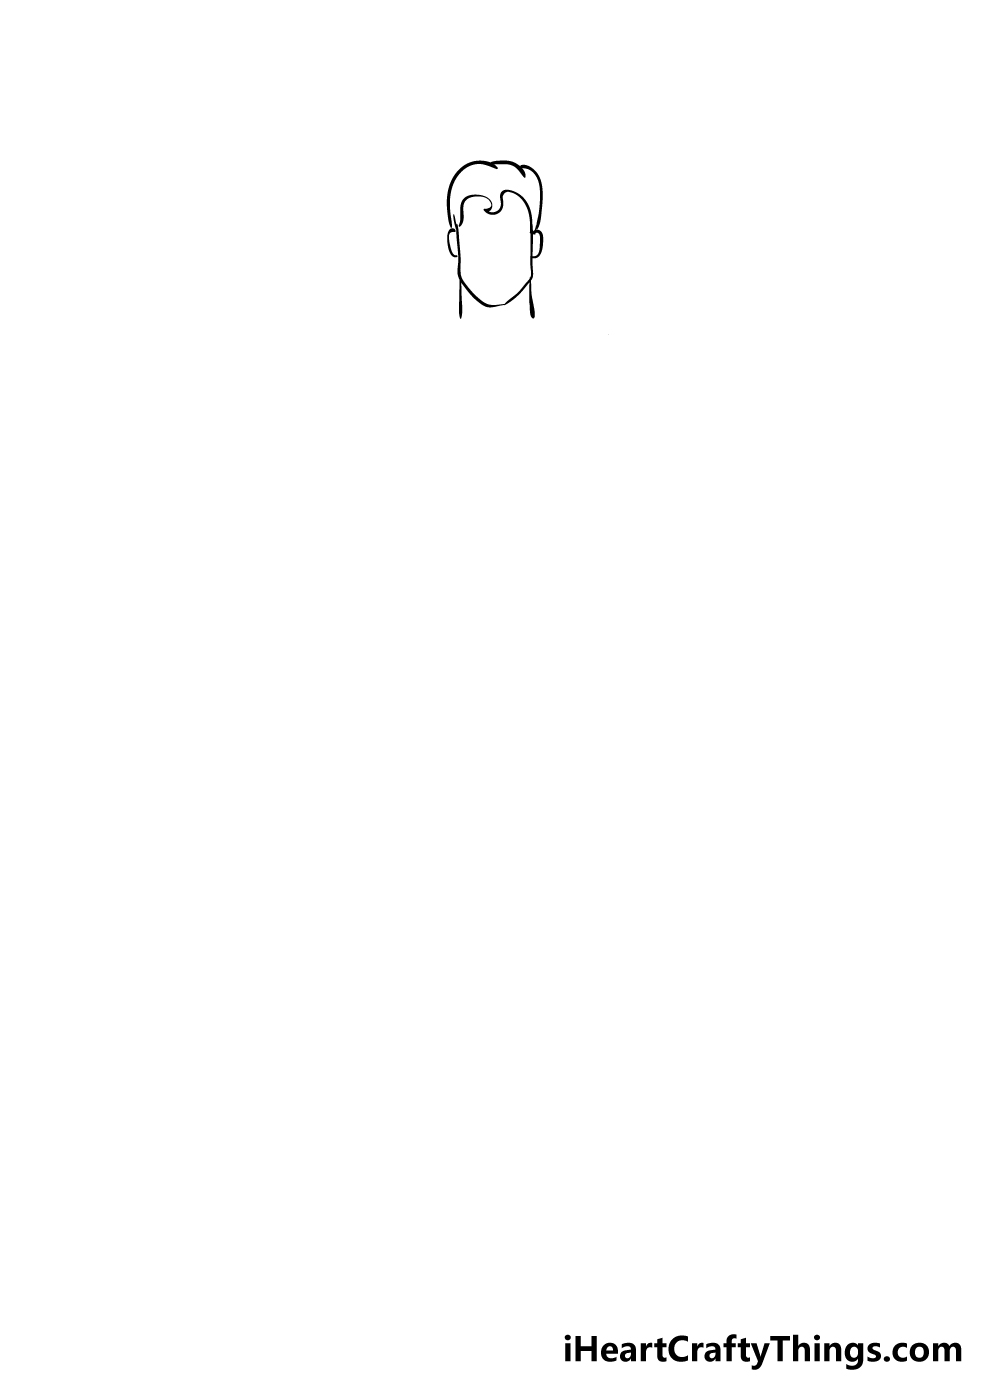 superhero drawing step 2